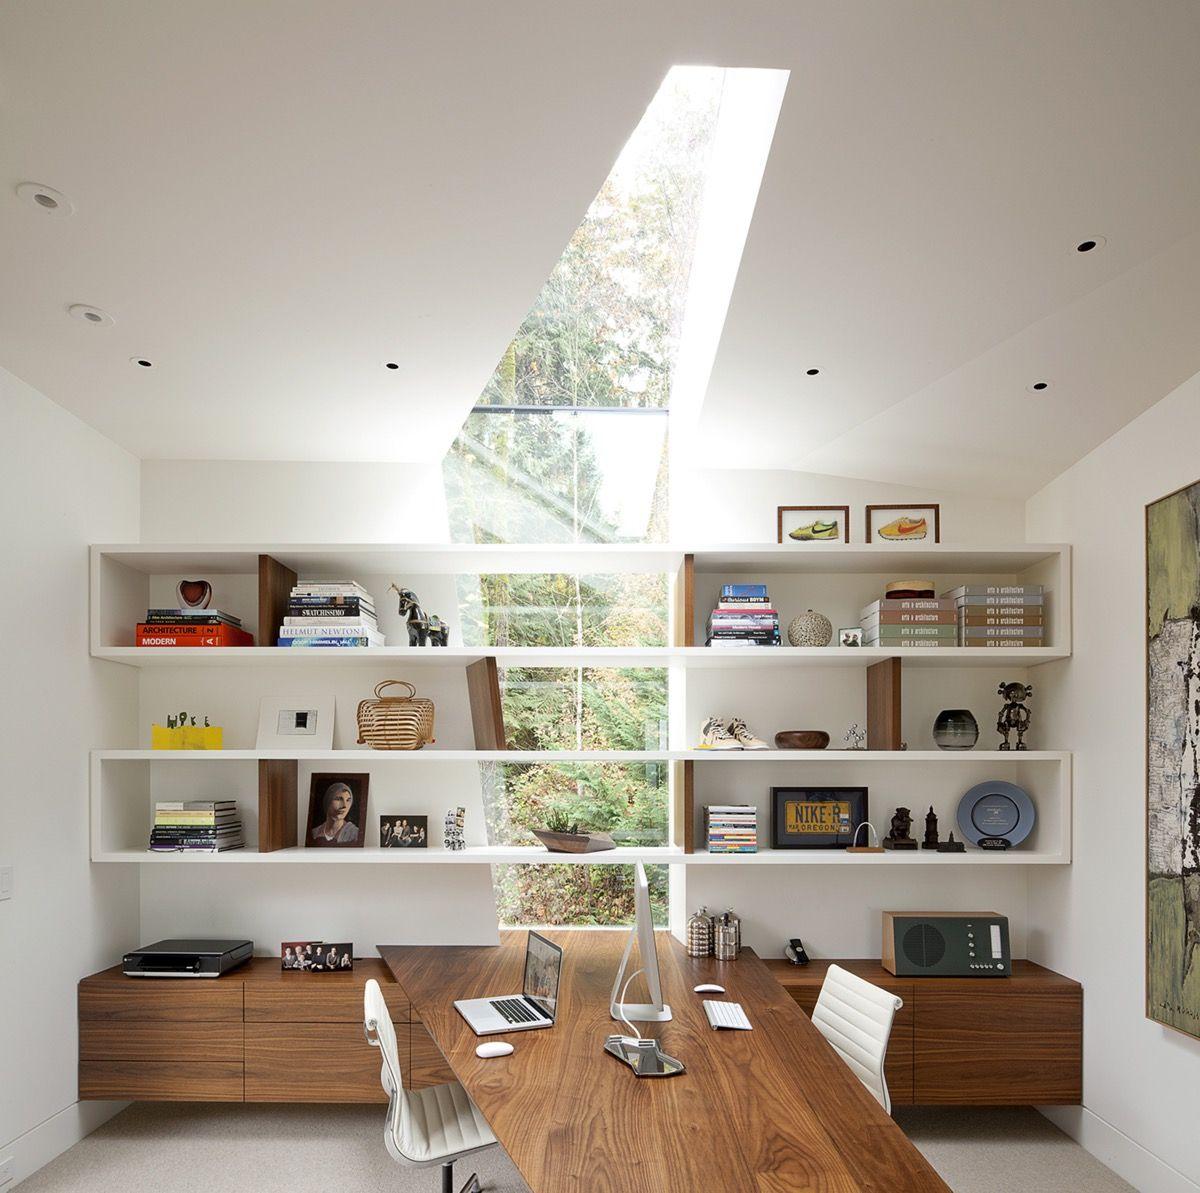 51 Modern Home Office Design Ideas For Inspiration Modern Home Offices Home Office Layouts Modern Home Office